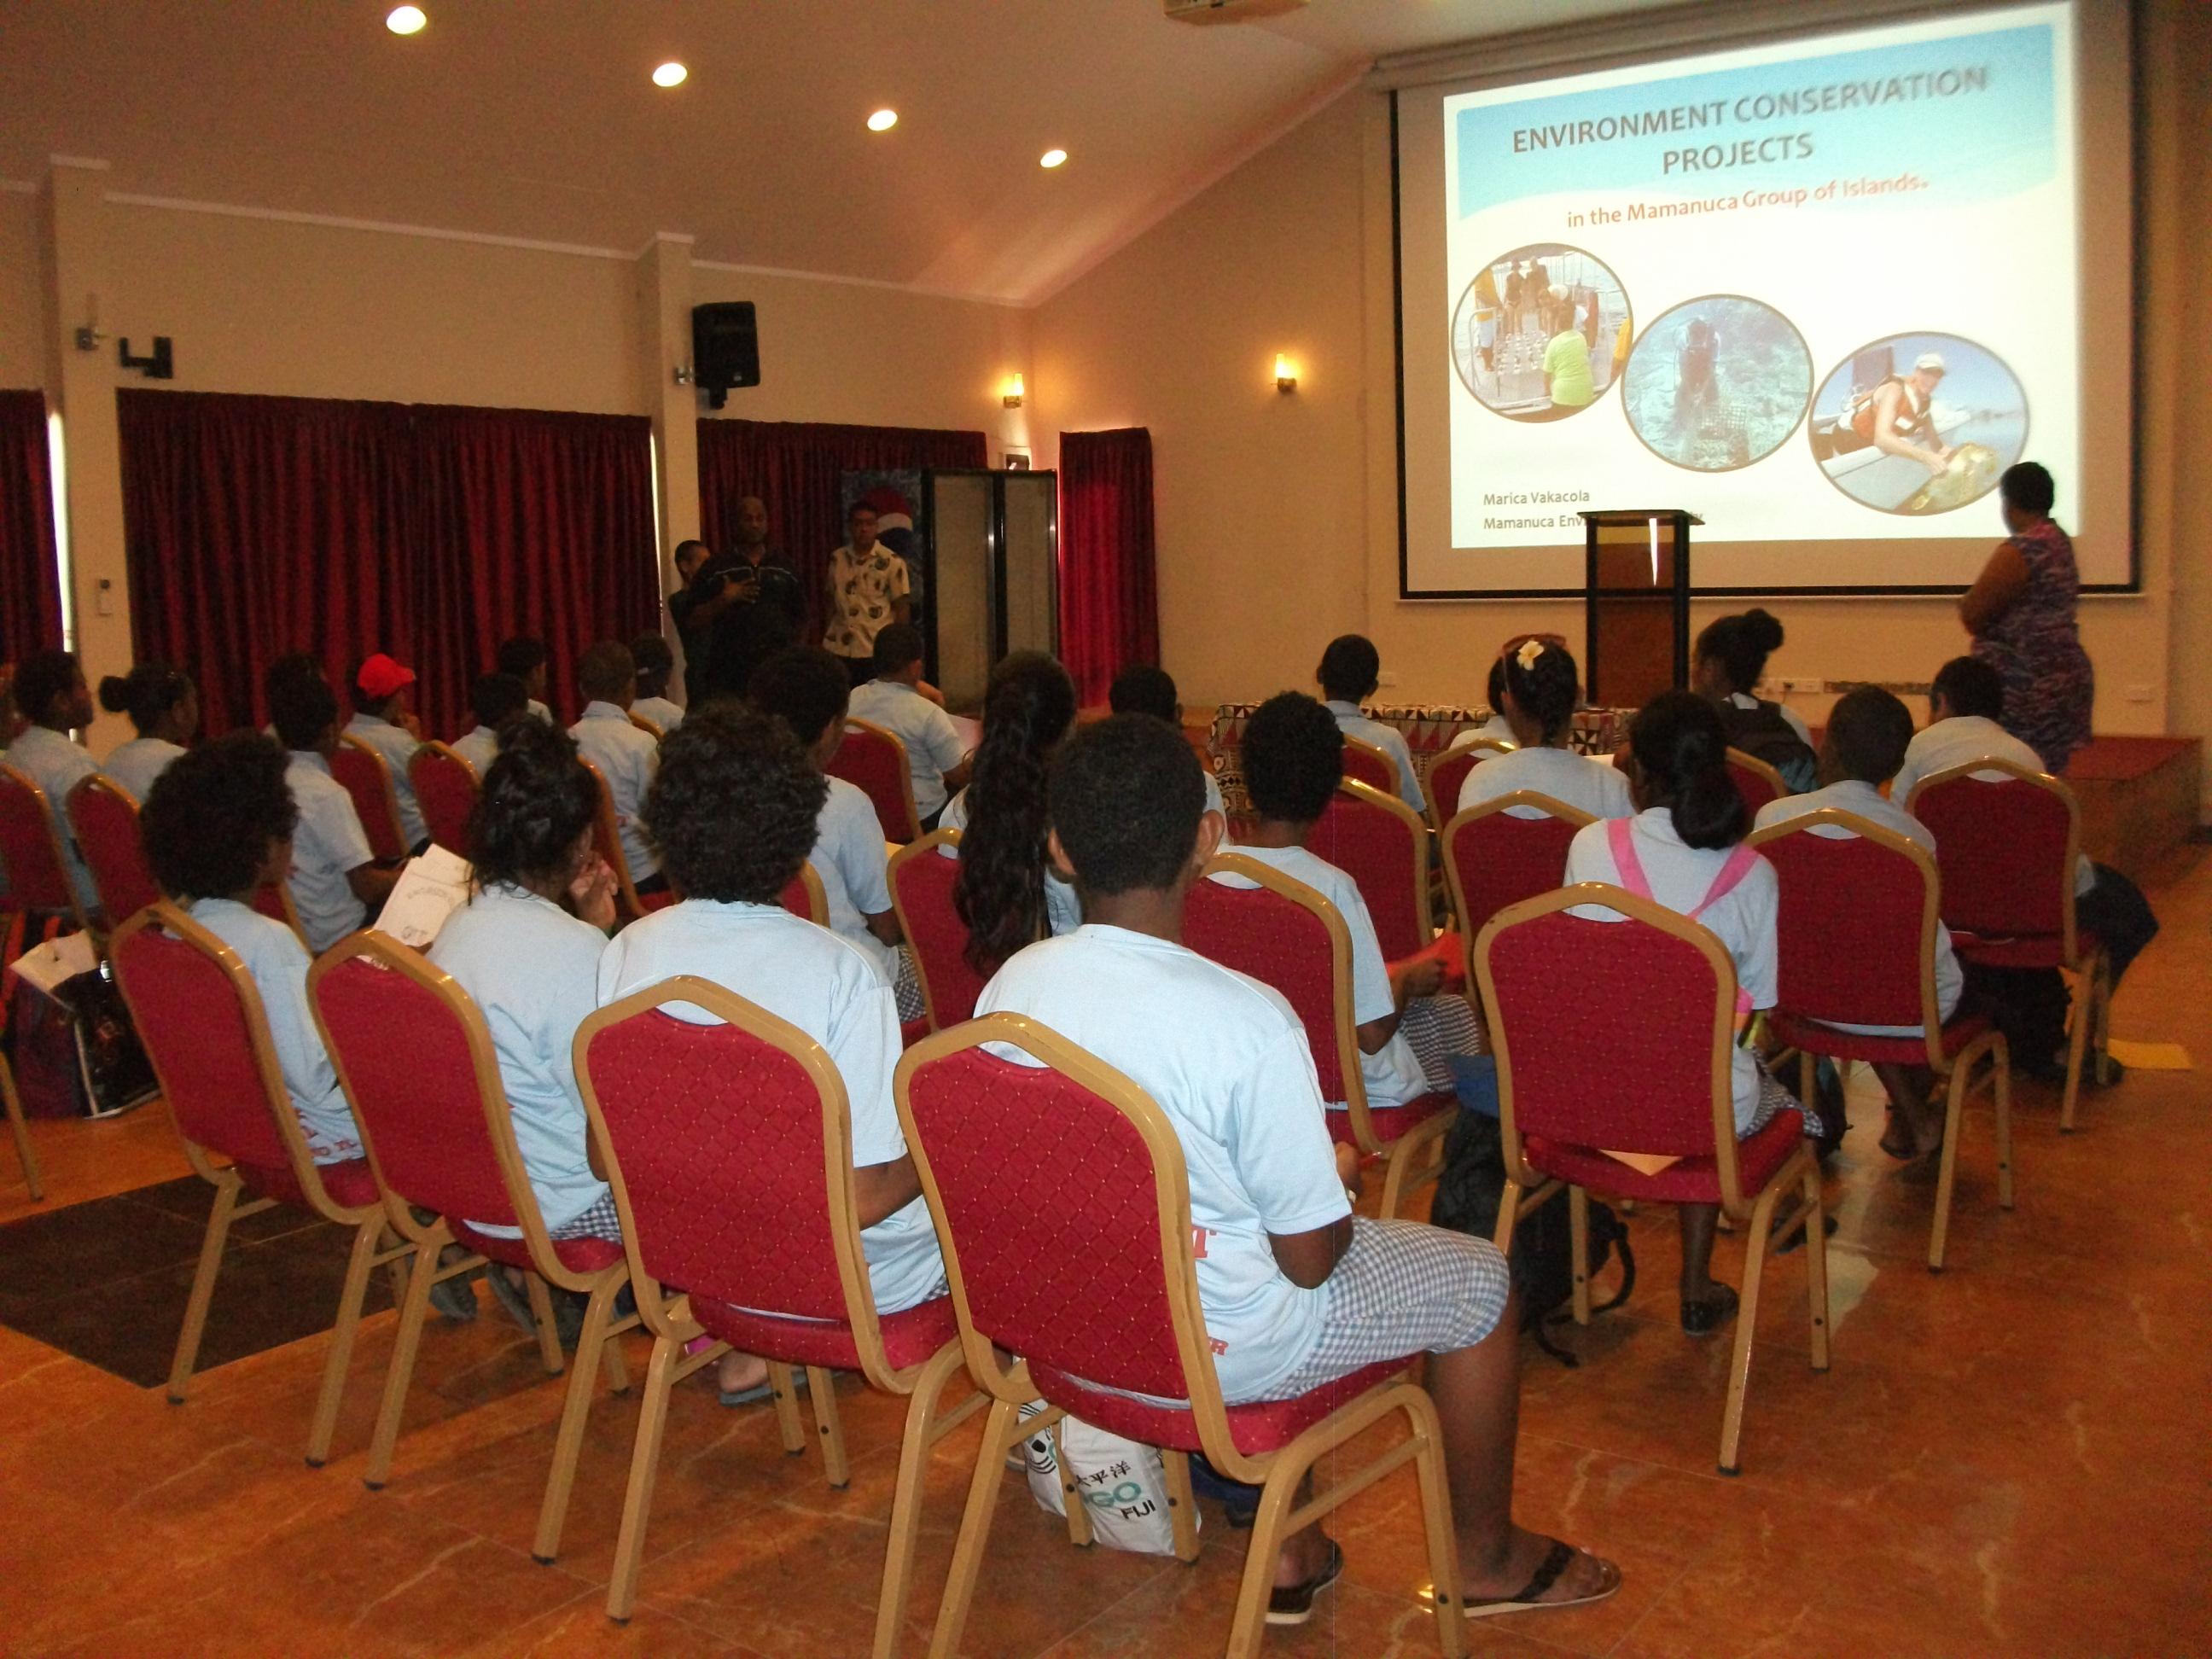 Pupils explore the Mamanuca group